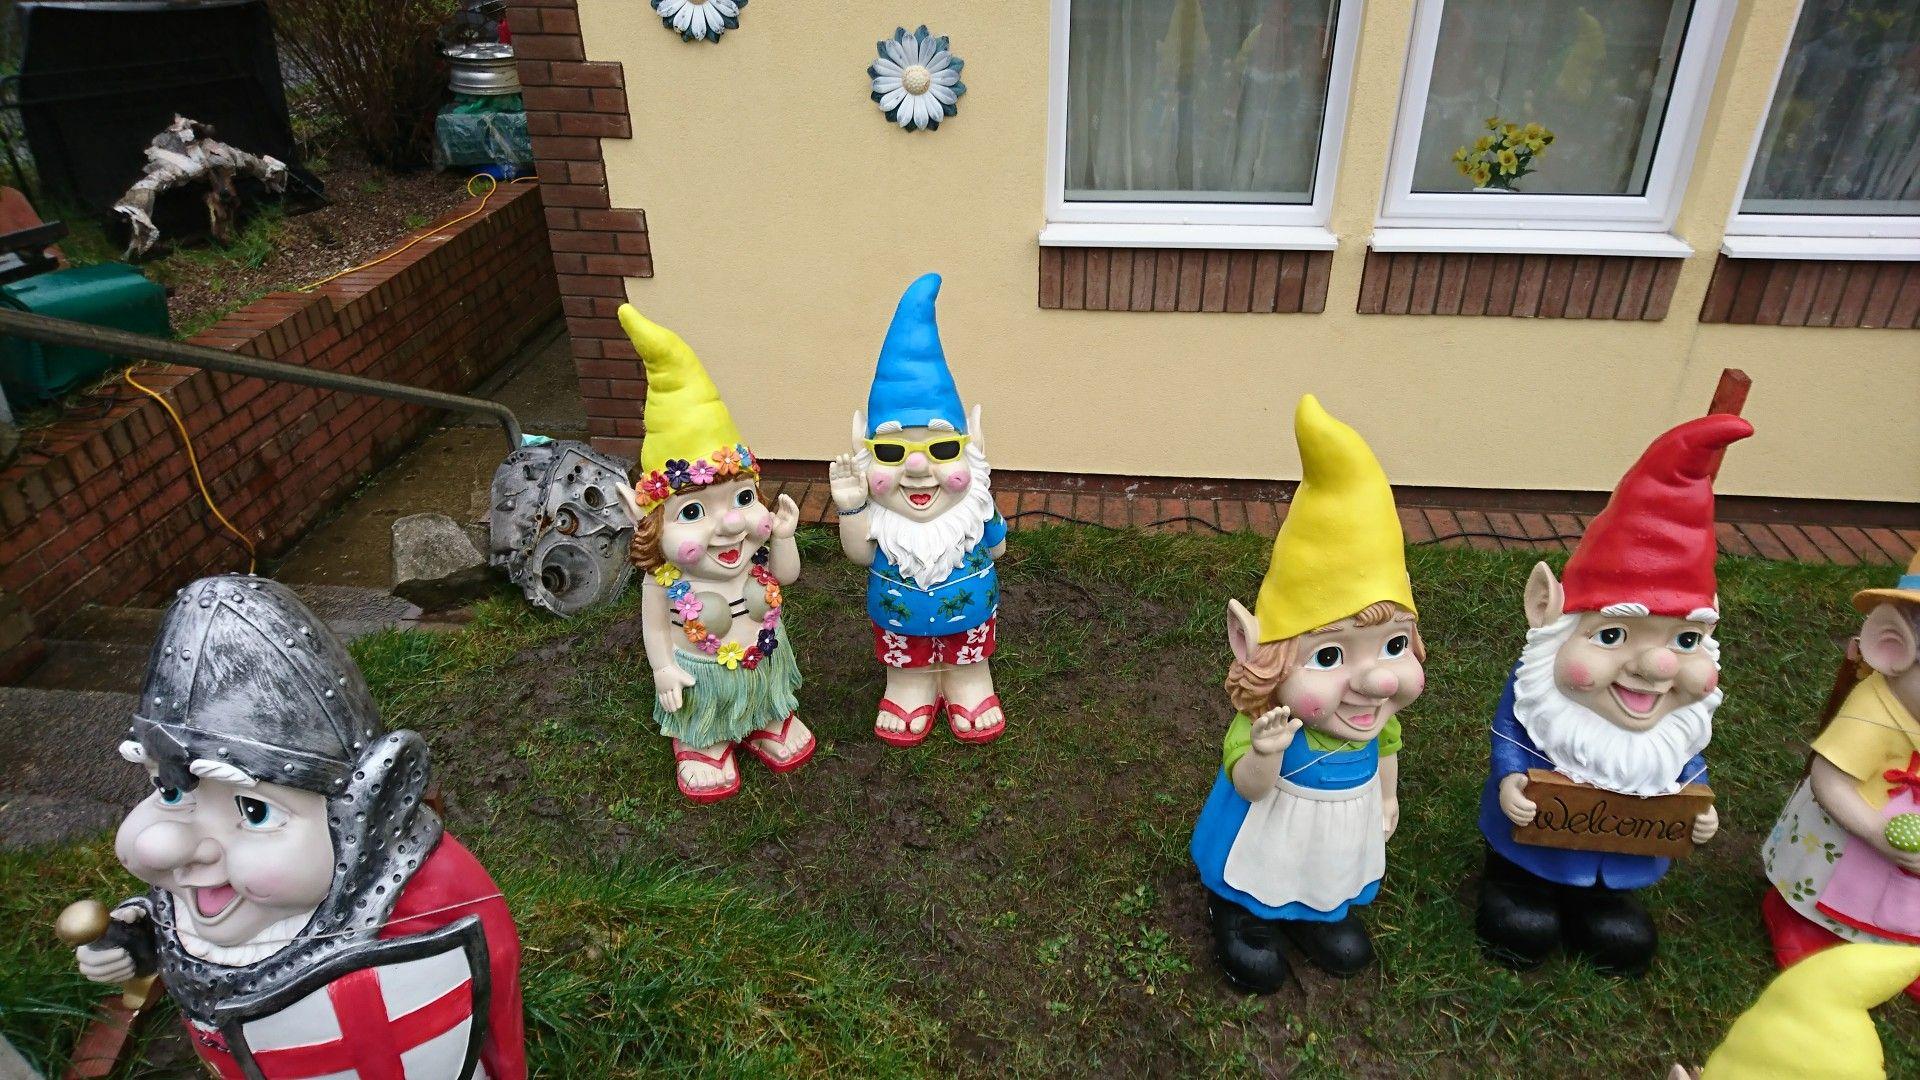 Pin by Vikki Nugent on Asda Gnomes Asda gnomes